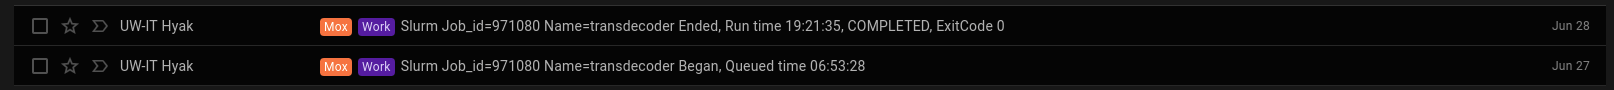 Screencap of Mox Transdecoder run time